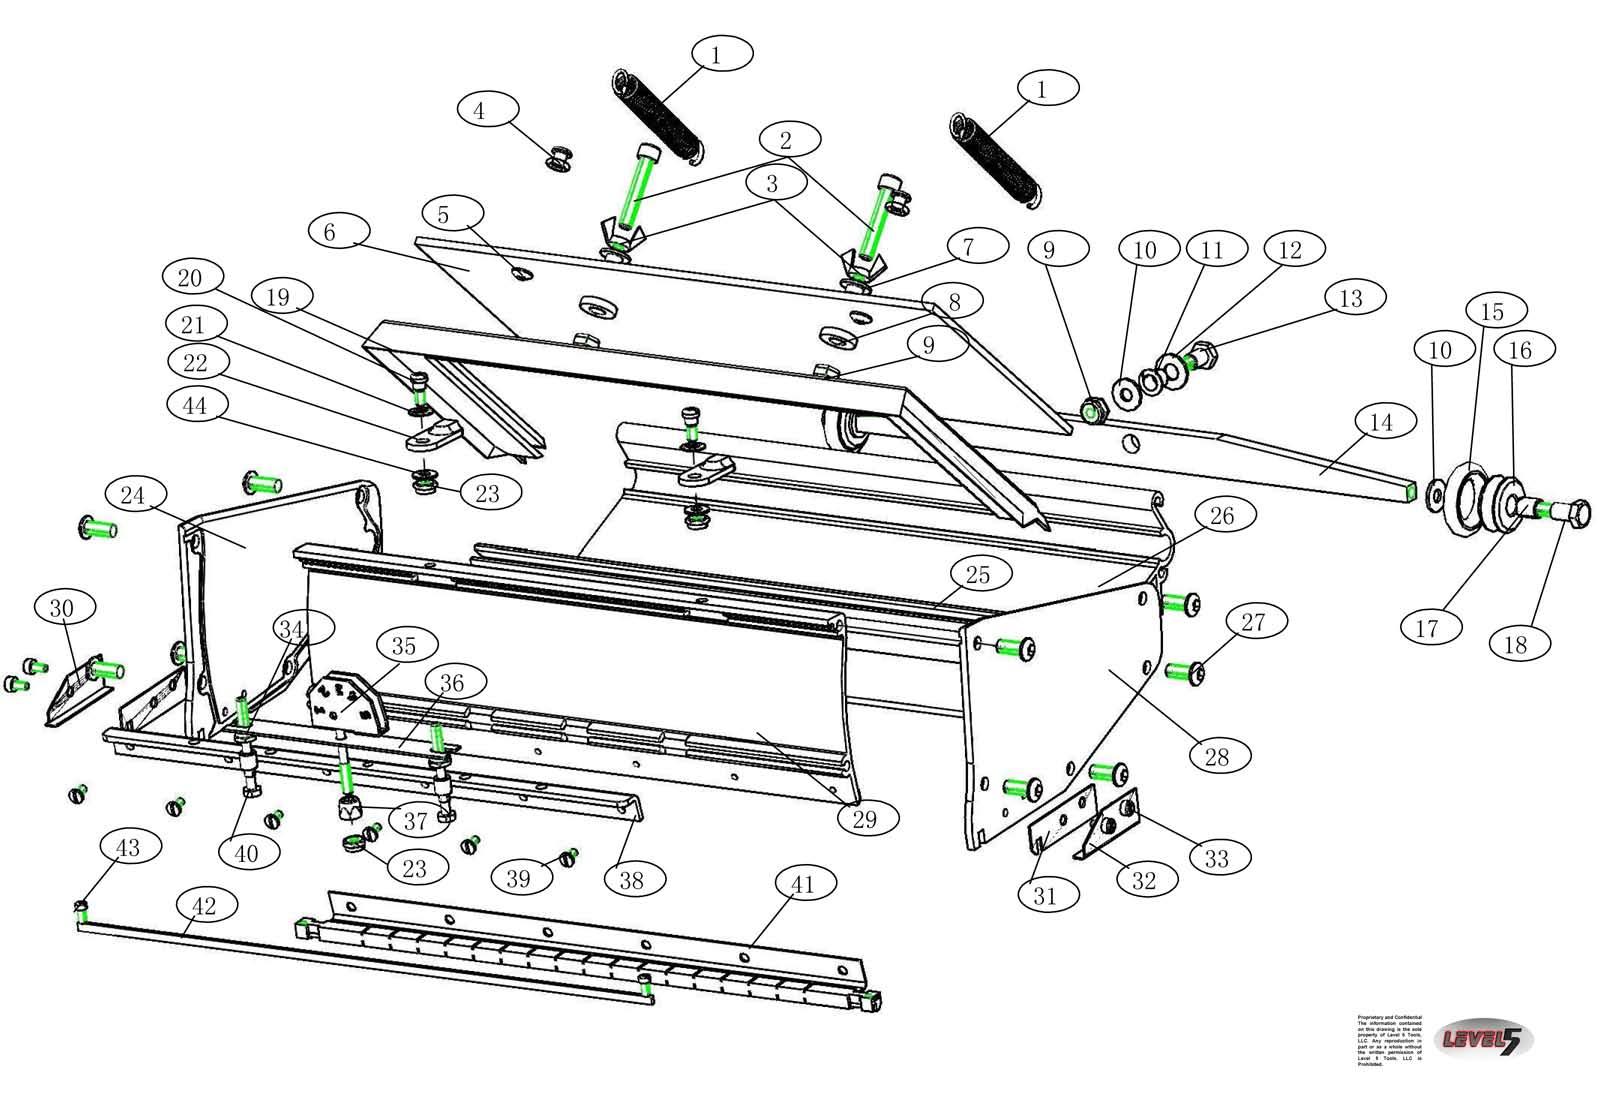 Drywall Tools Level 5 Box Parts Level 5 10 Box Parts